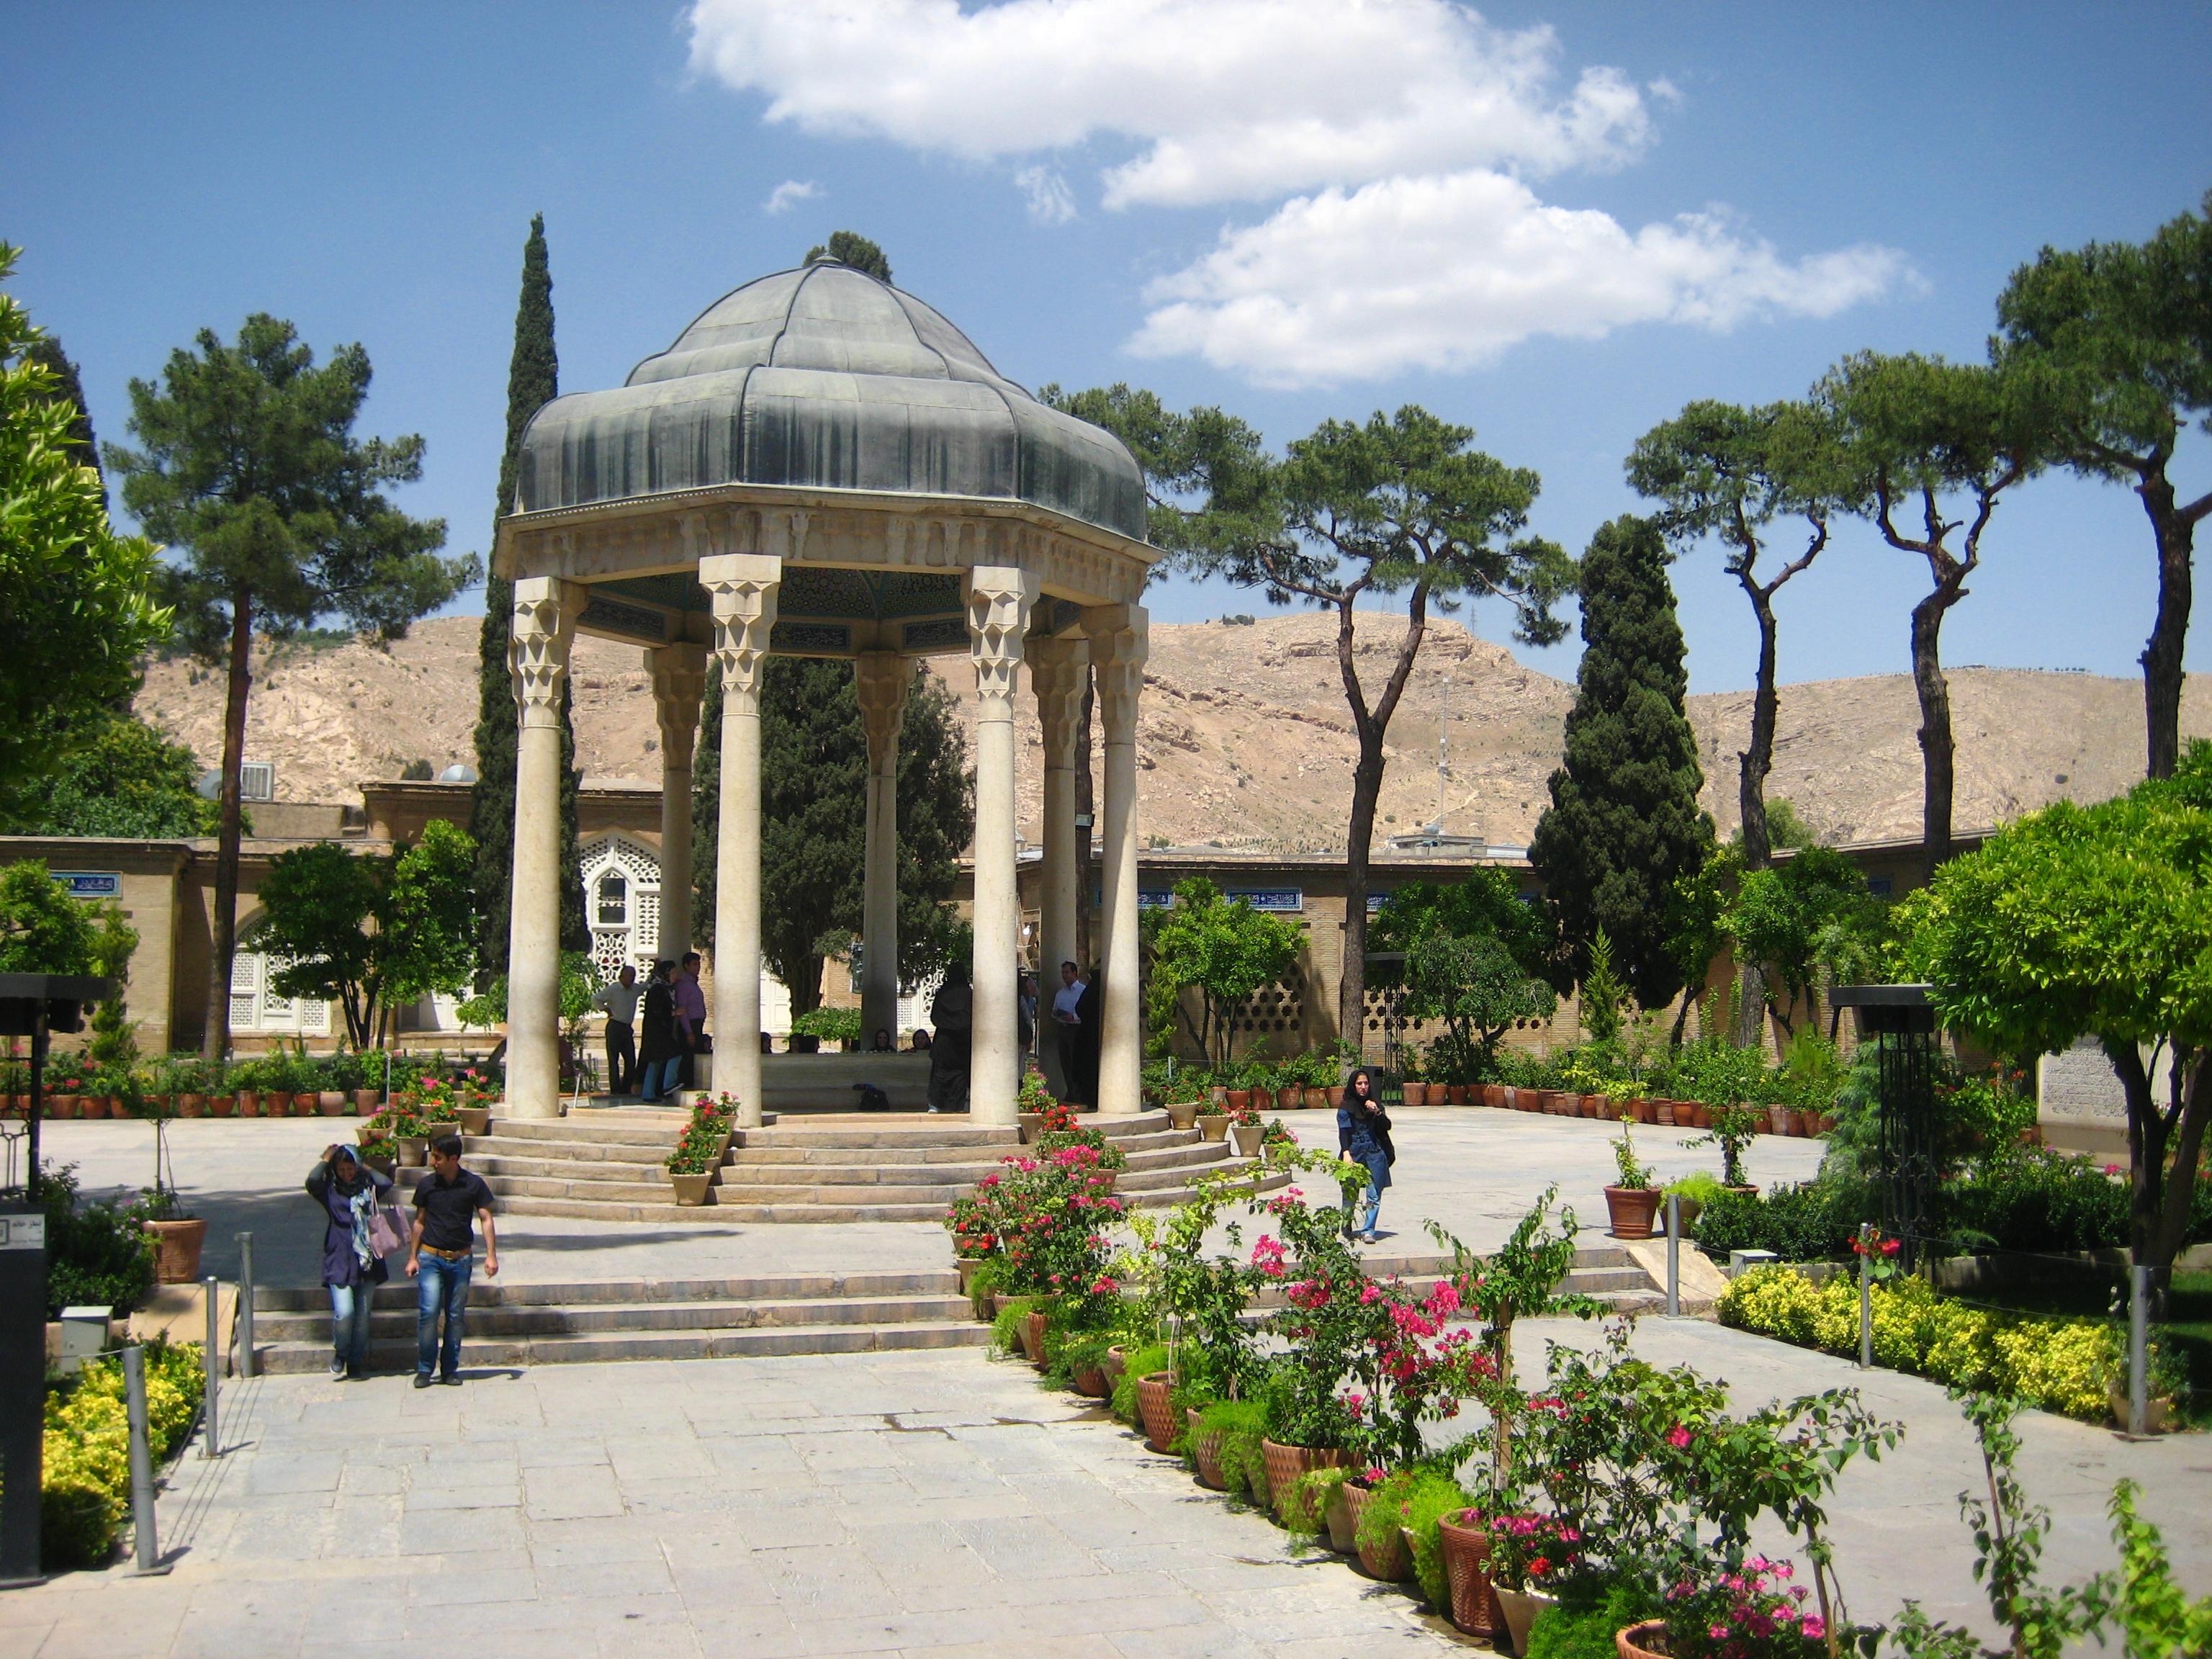 File:Maghbareh Hafez Shiraz.JPG - Wikimedia Commons